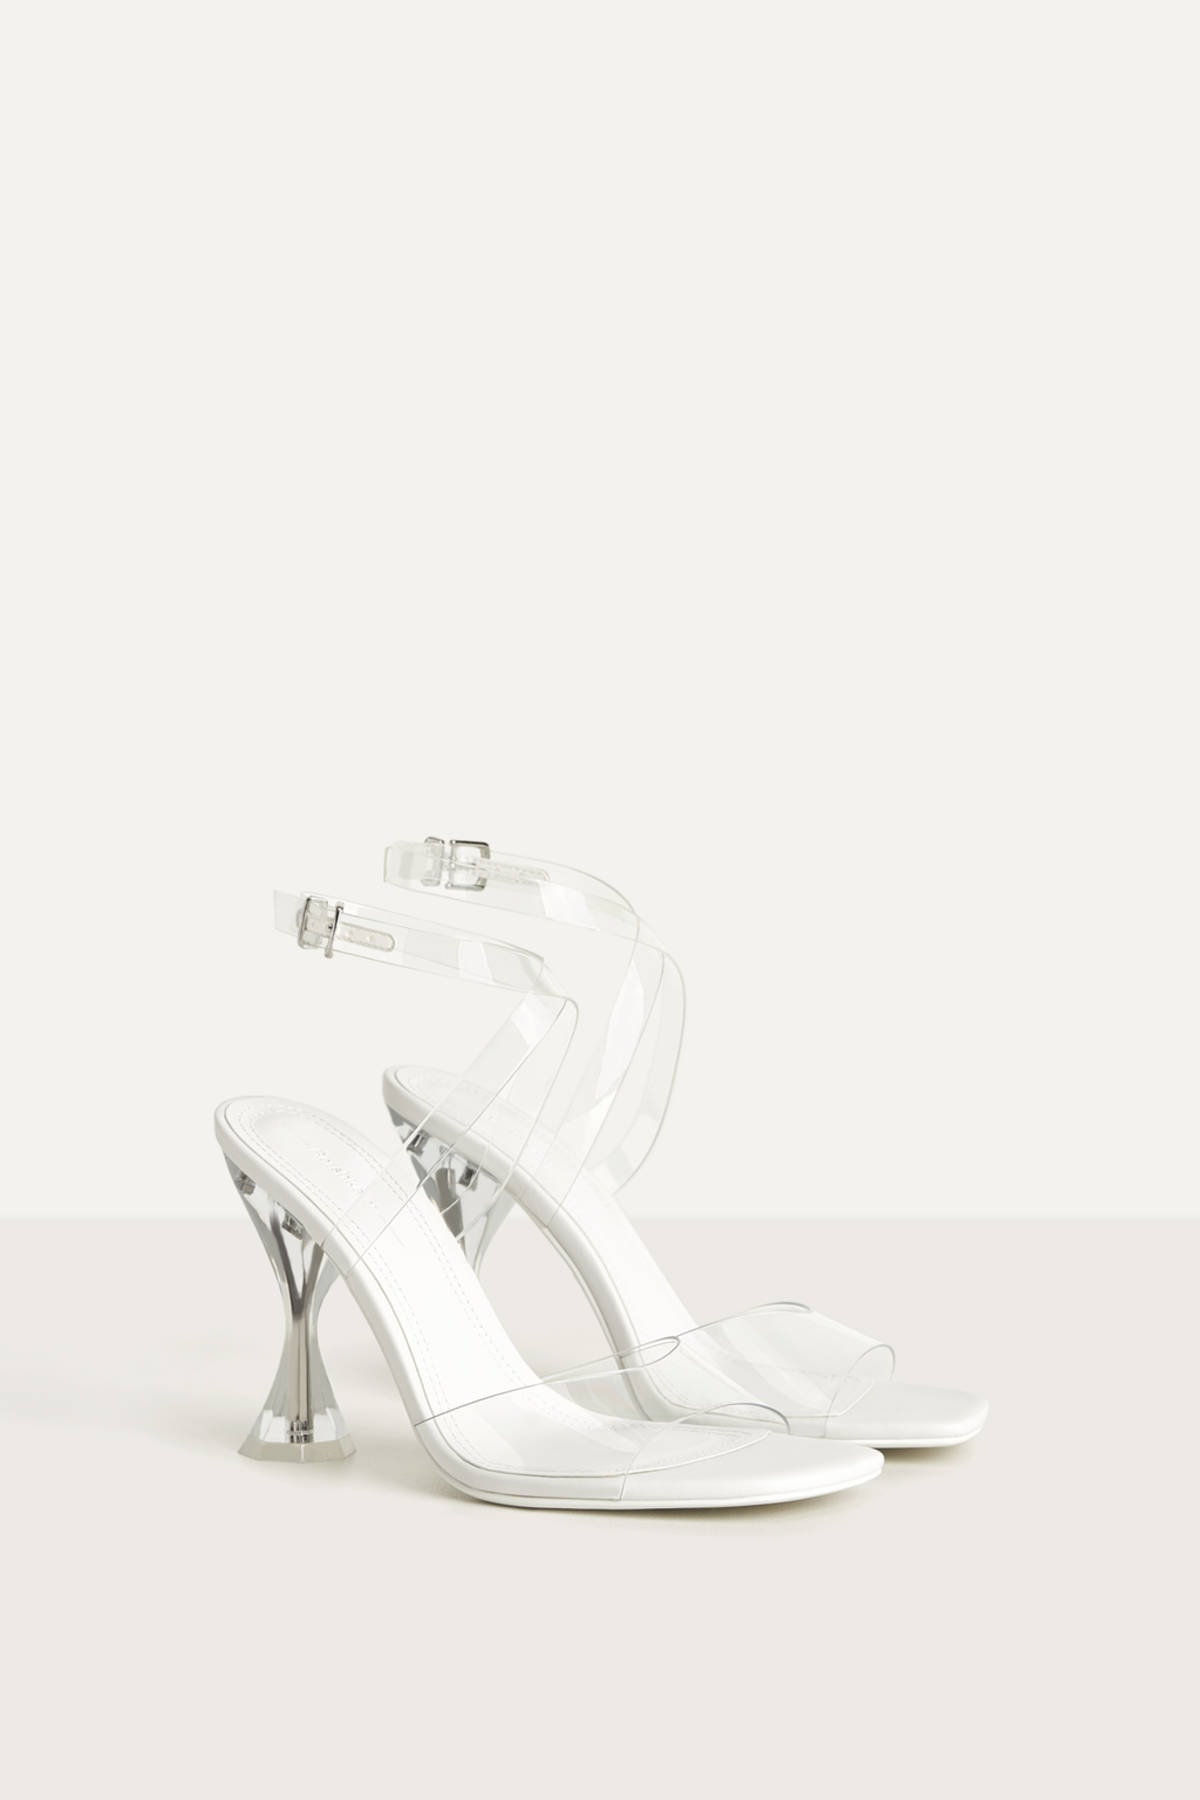 Bershka Kadin Transparan Vinil Bantli Ve Metakrilat Yuksek Topuklu Sandalet 11940560 Trendyol